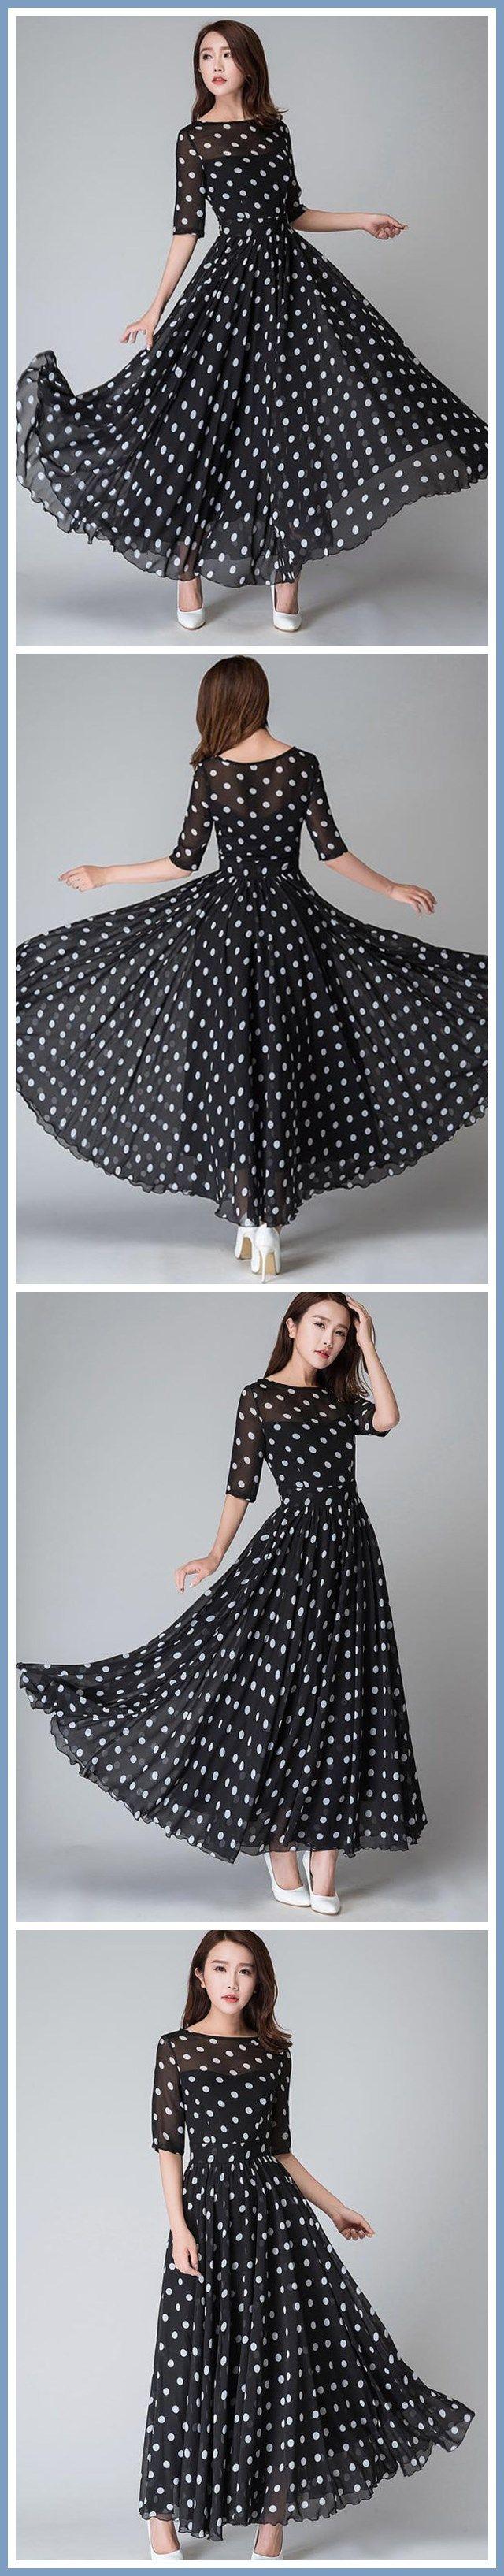 Polka Dots Half Sleeve Round Neck Expansion Maxi Dress